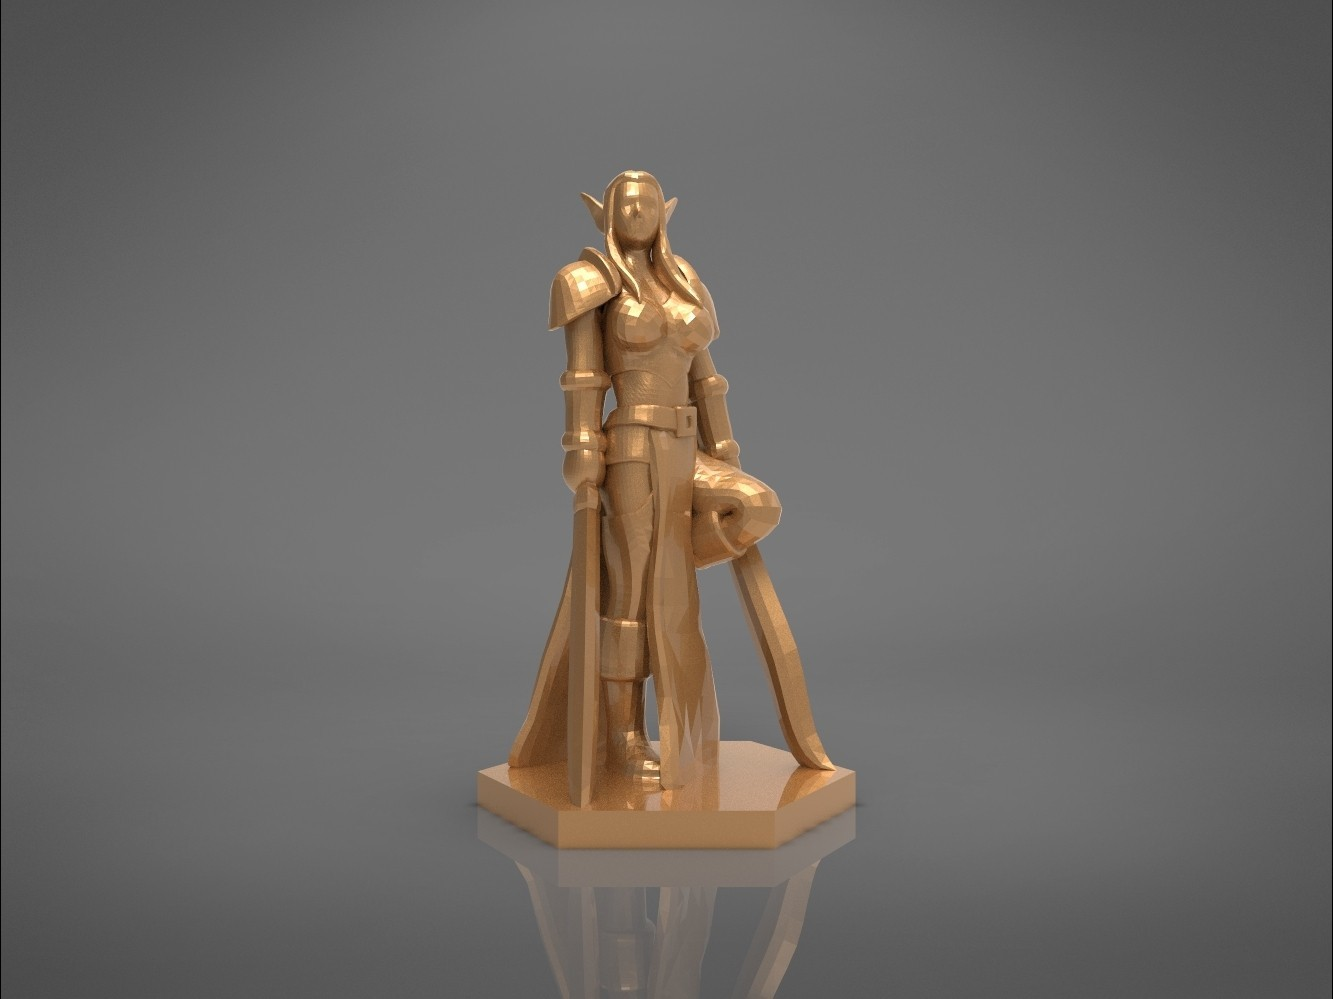 Warrior_2-front_perspective.323.jpg Download STL file ELF WARRIOR FEMALE CHARACTER GAME FIGURE 3D print model • 3D printing object, 3D-mon